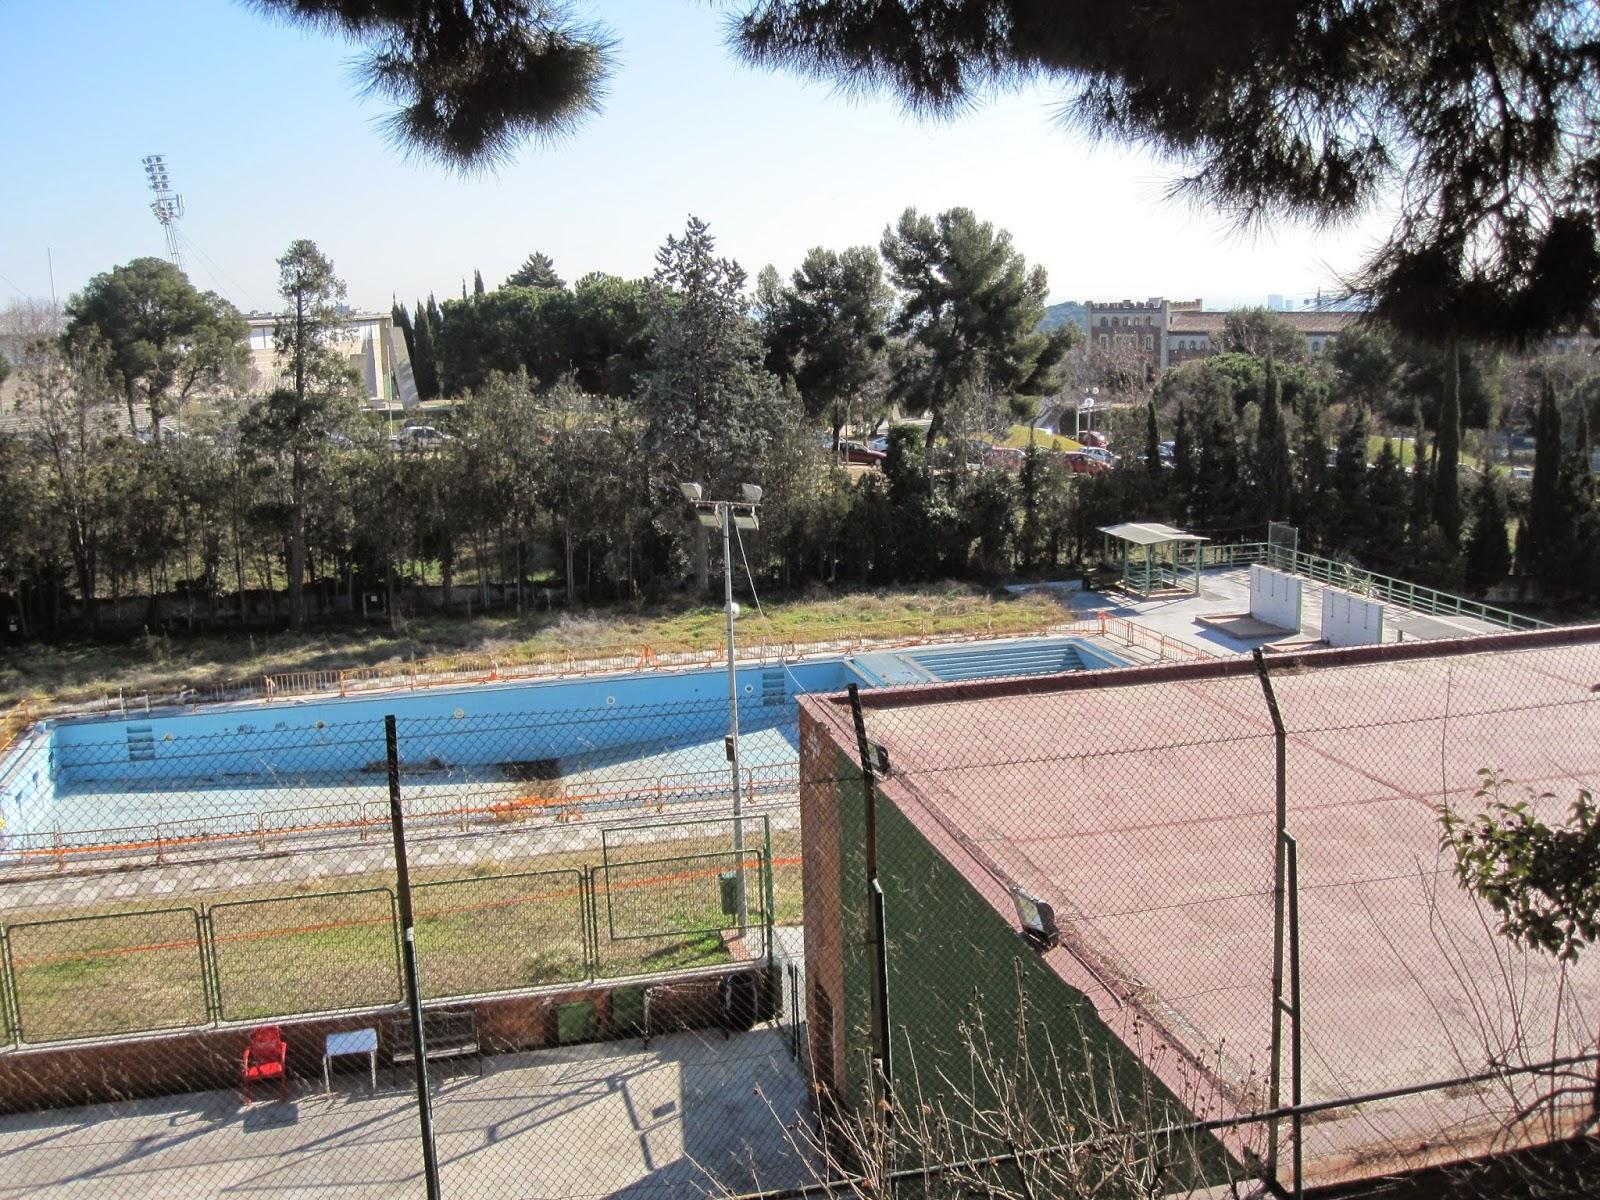 Tot barcelona la piscina de mundet o la muerte por abandono for Piscinas municipales barcelona